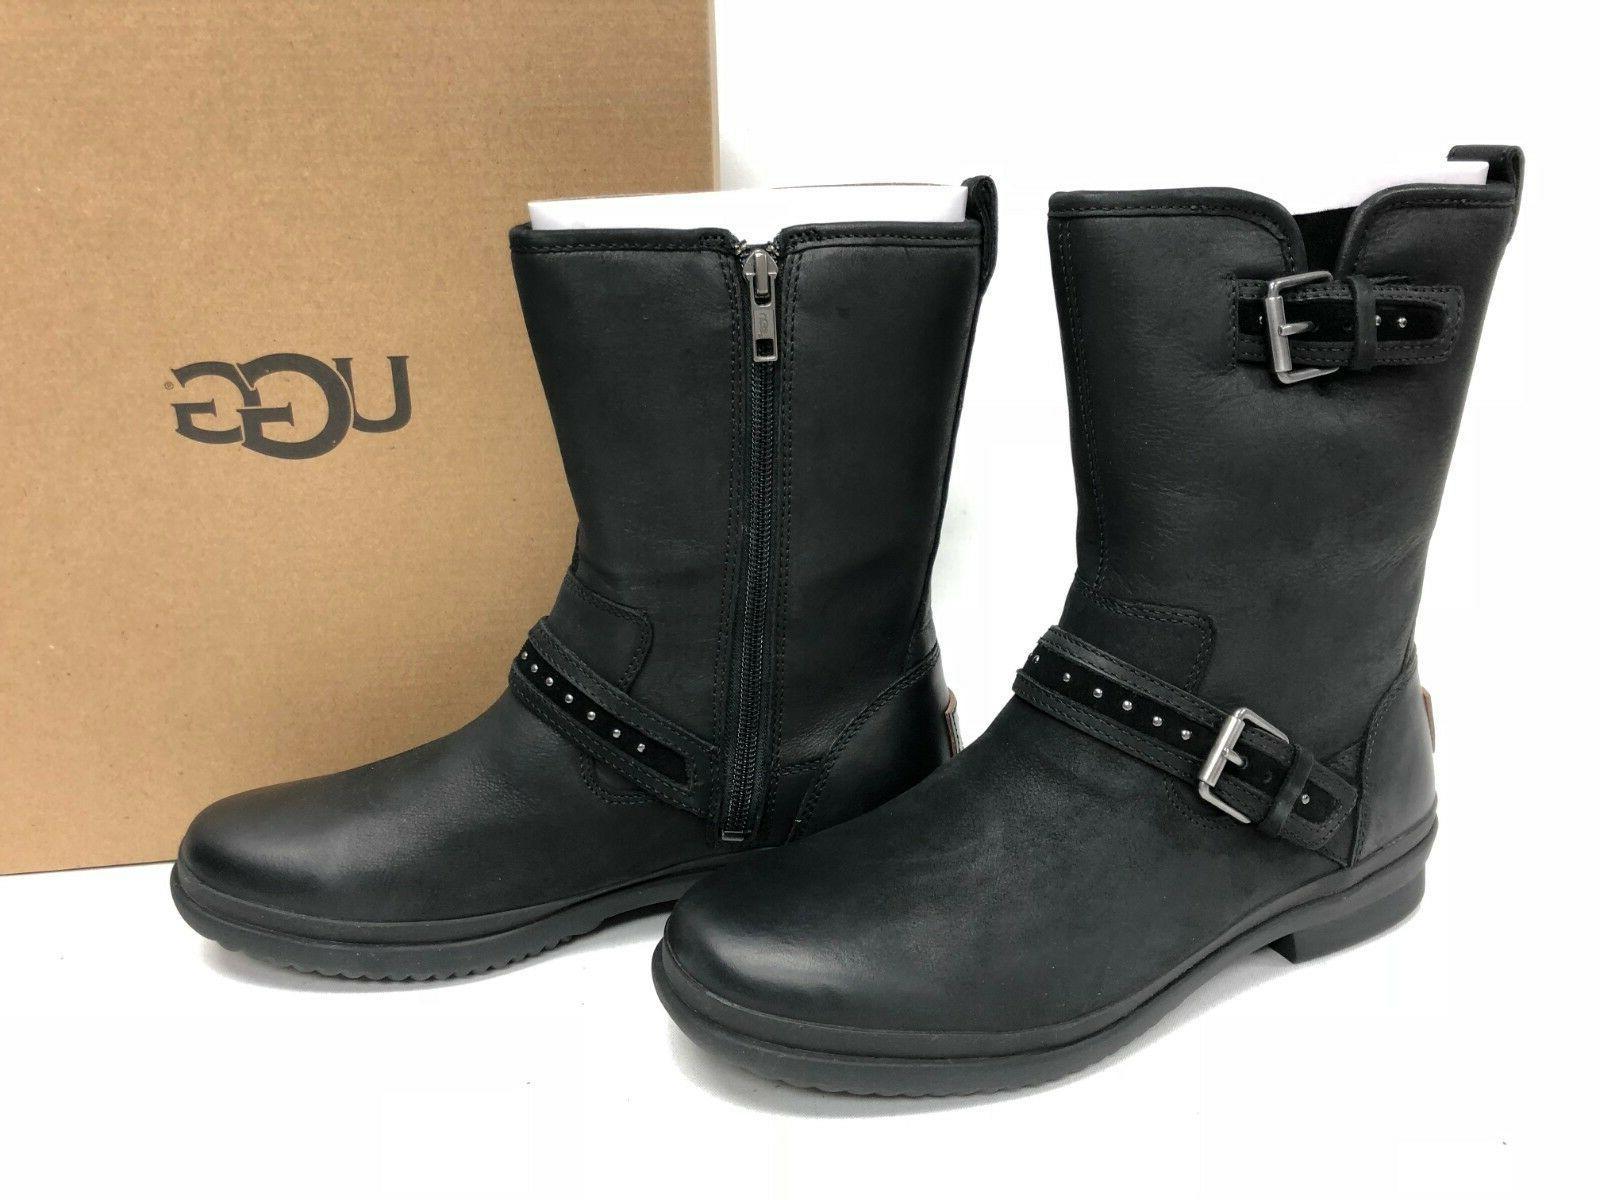 Ugg Jenise Stud Boots 1018997 WP Buckle